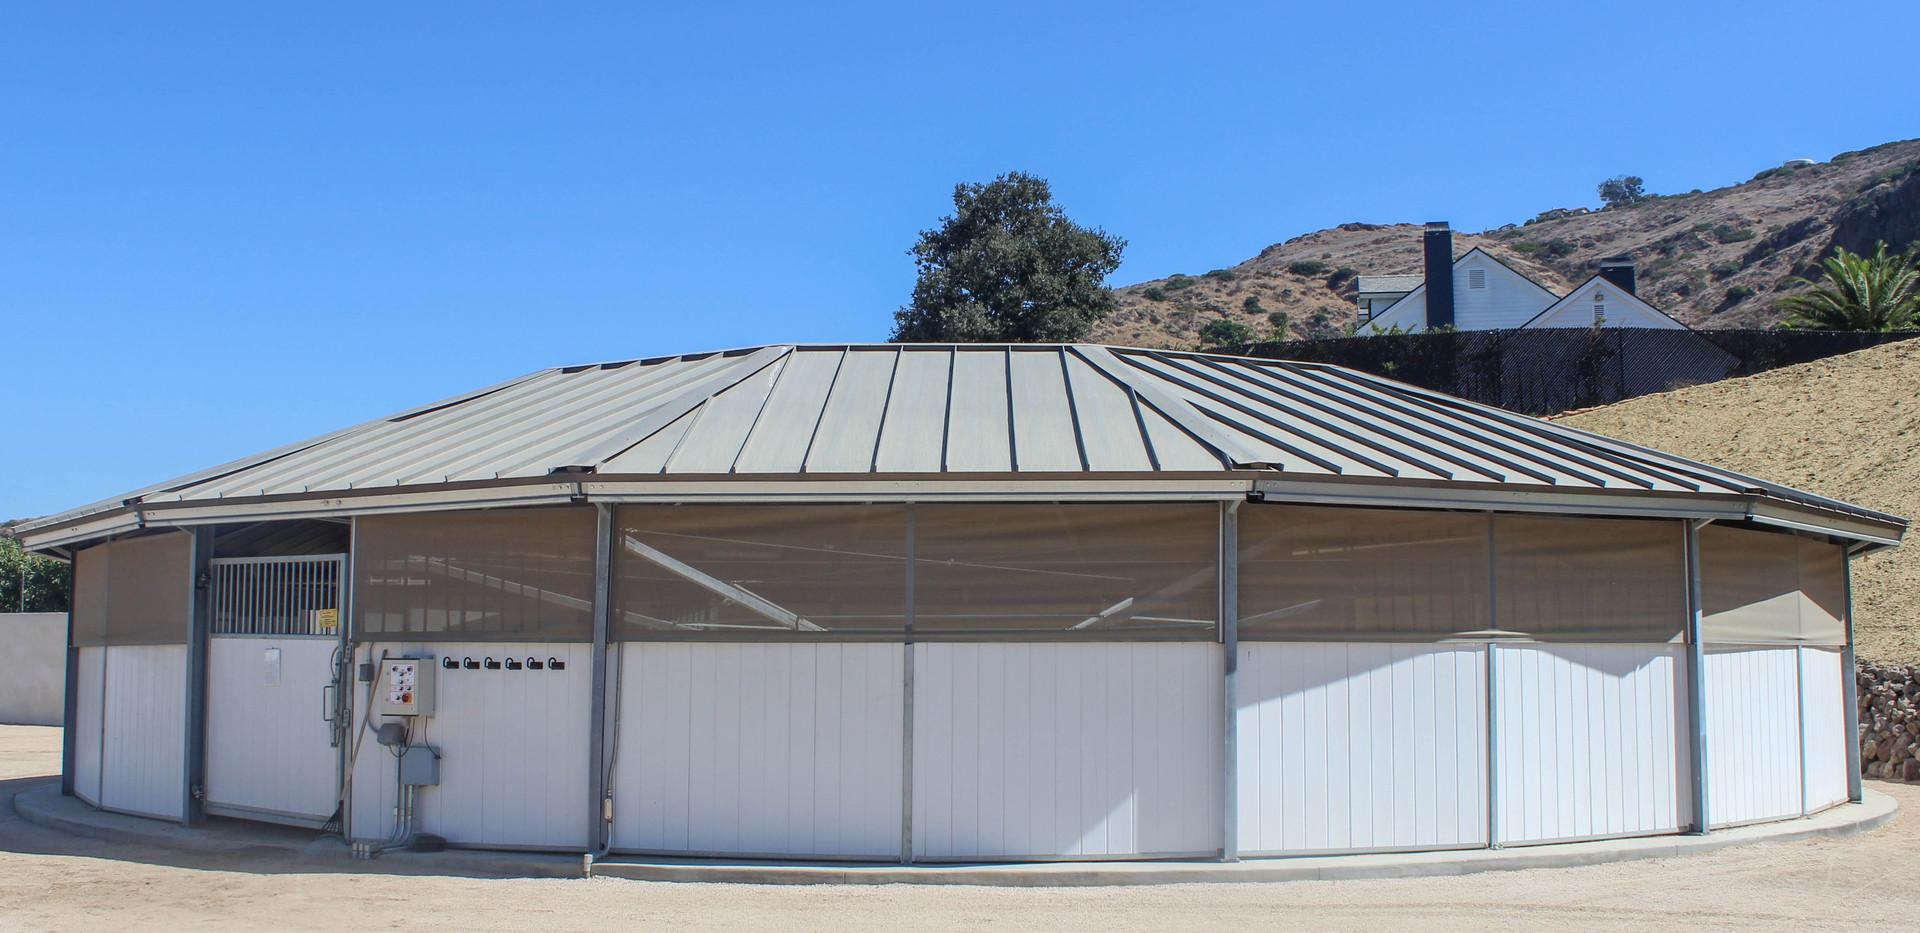 Q of E Farm - Home of Ingenium Farm - Eurosizer